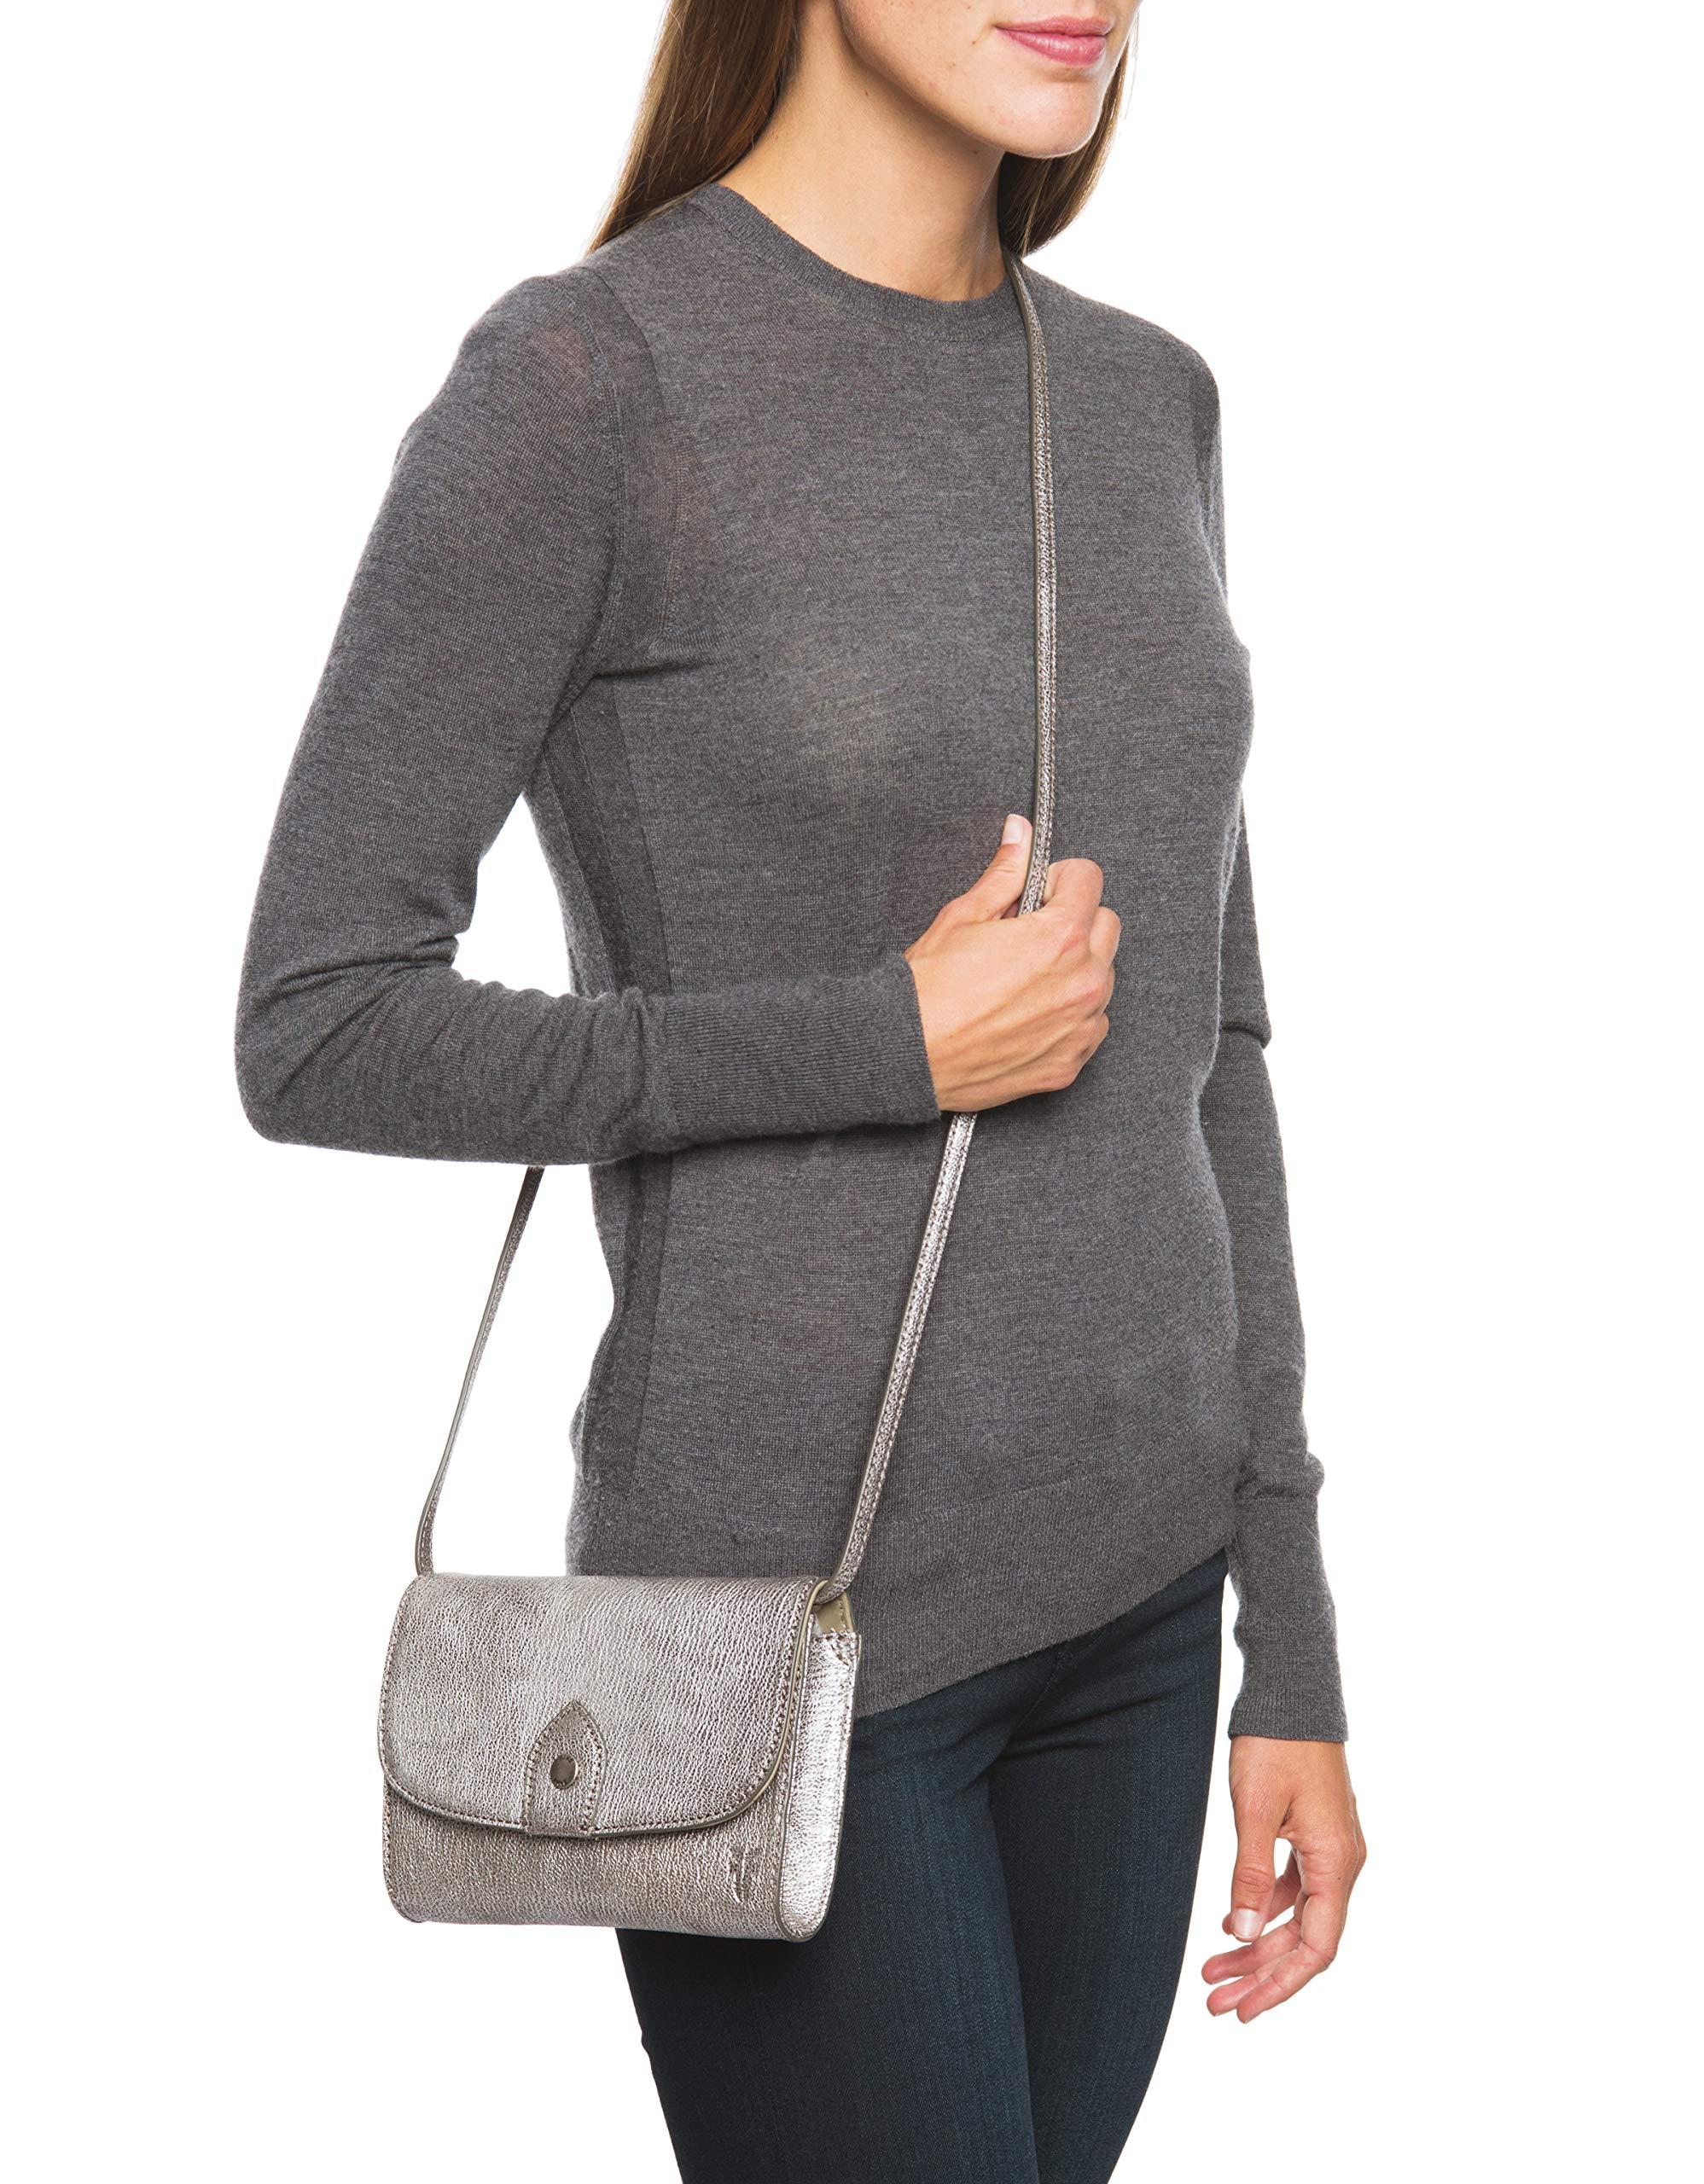 FRYE Melissa Wallet Crossbody Clutch Leather Bag, silver by FRYE (Image #6)